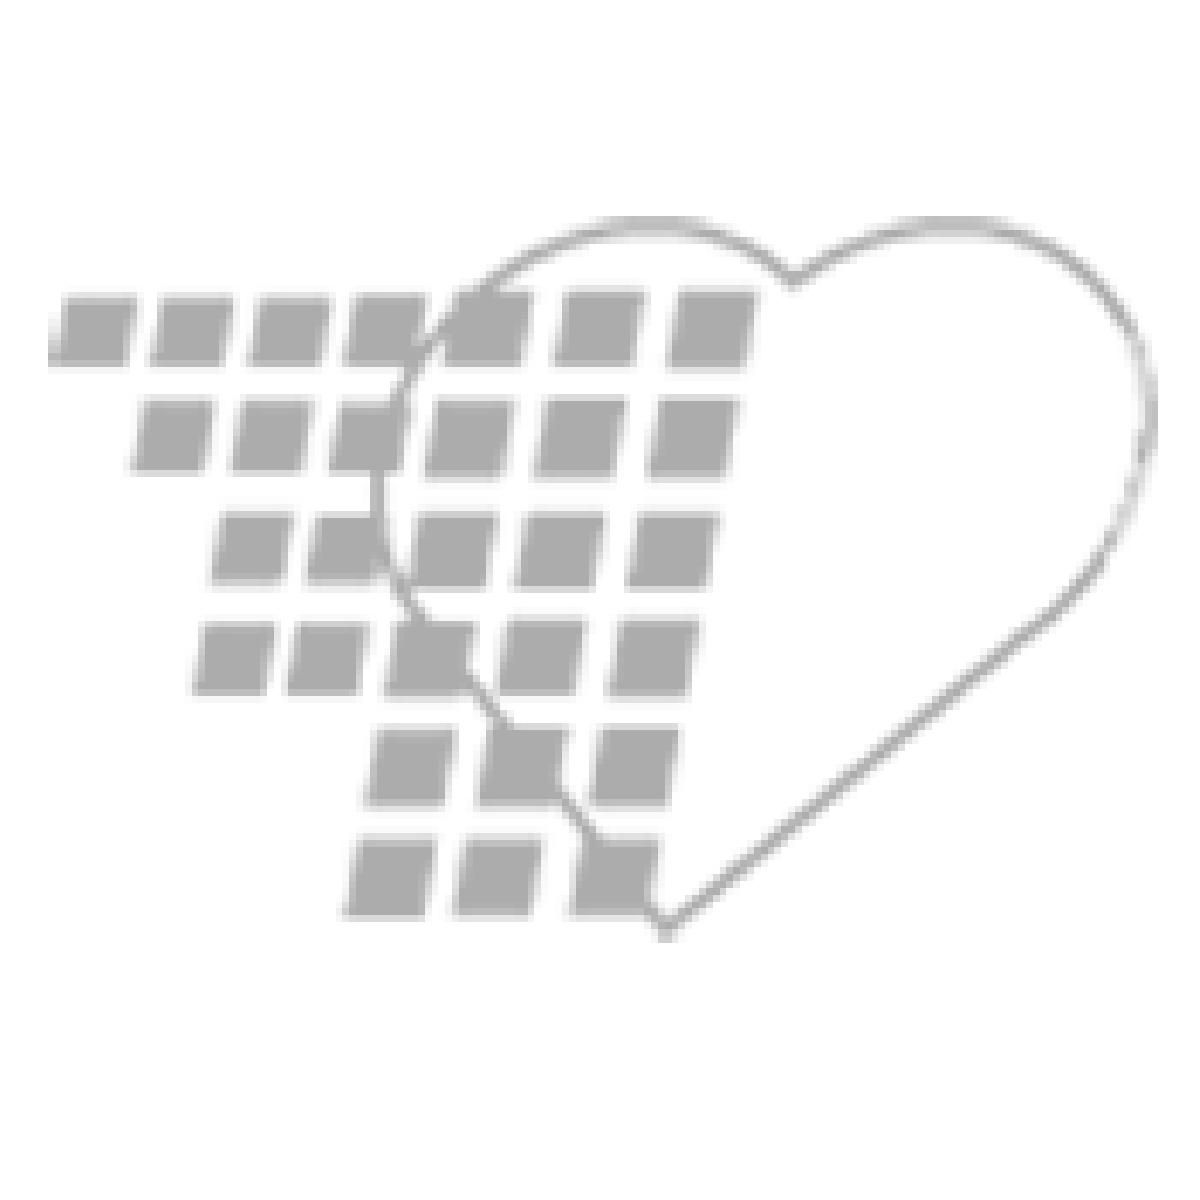 02-80-3401 SimScope™ Stethoscope